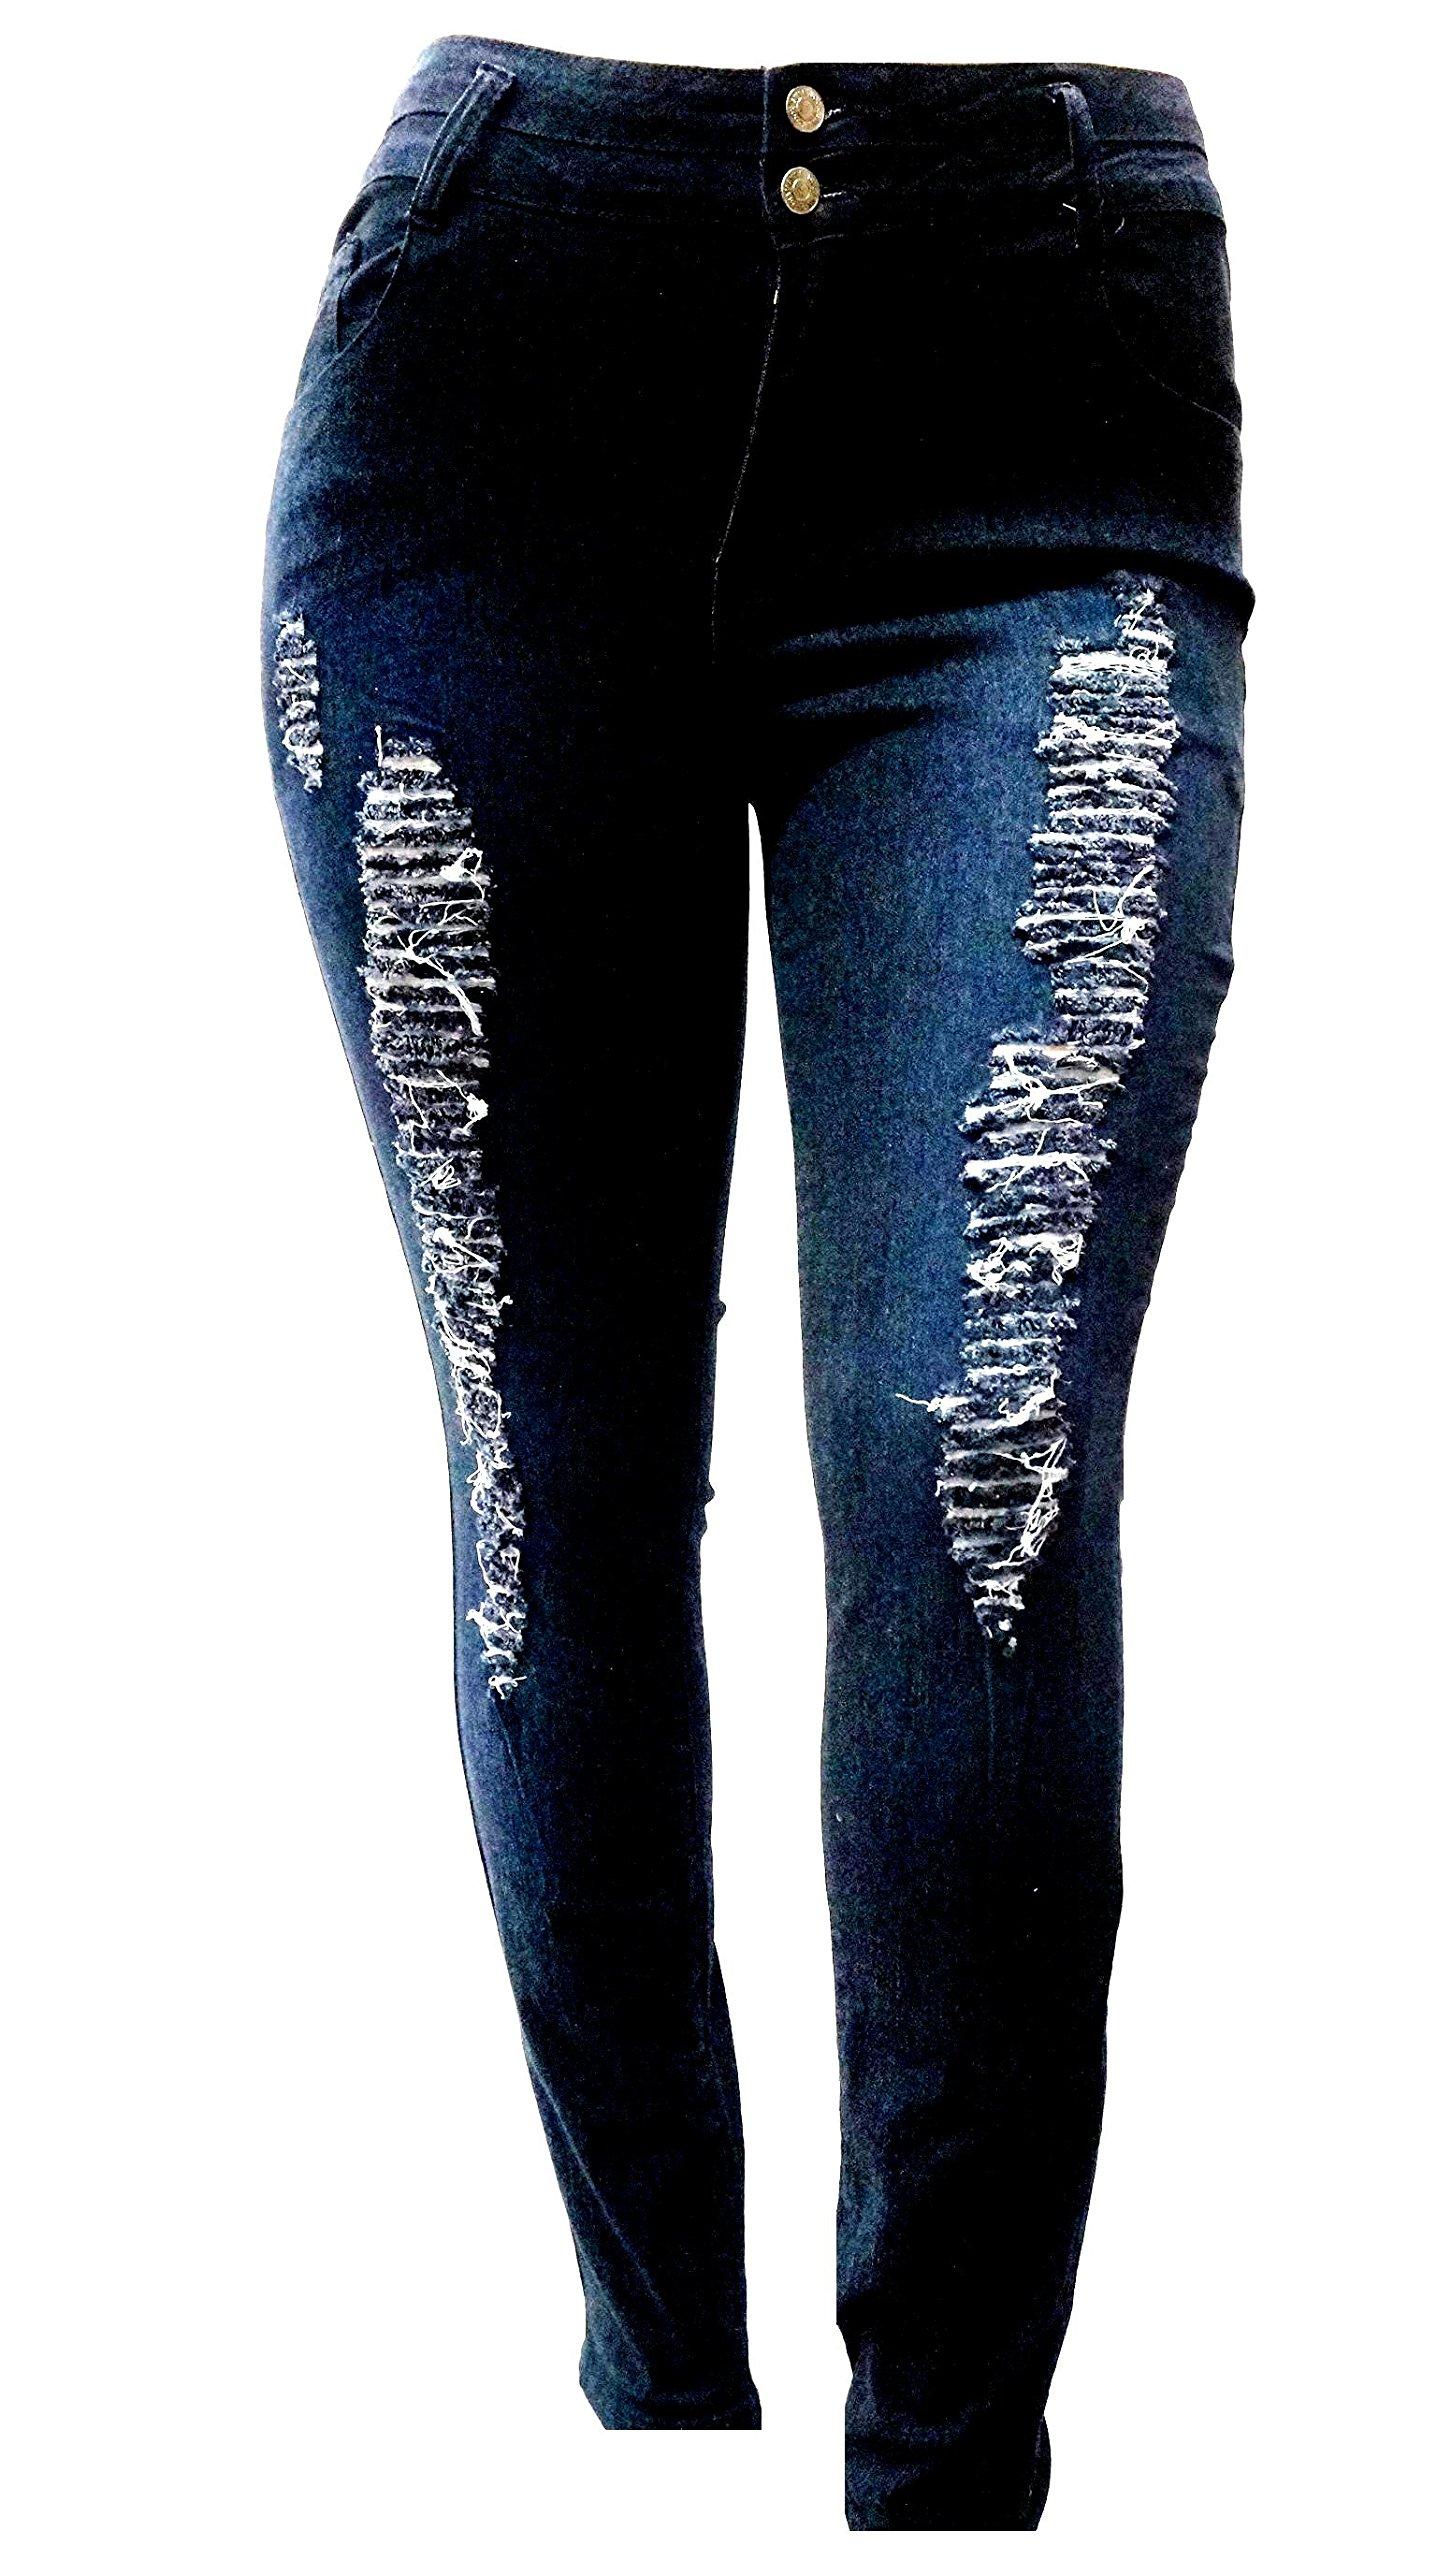 J&K88 Womens Plus Size Black Denim Jeans Stretch Skinny Ripped Distressed Pants (18)